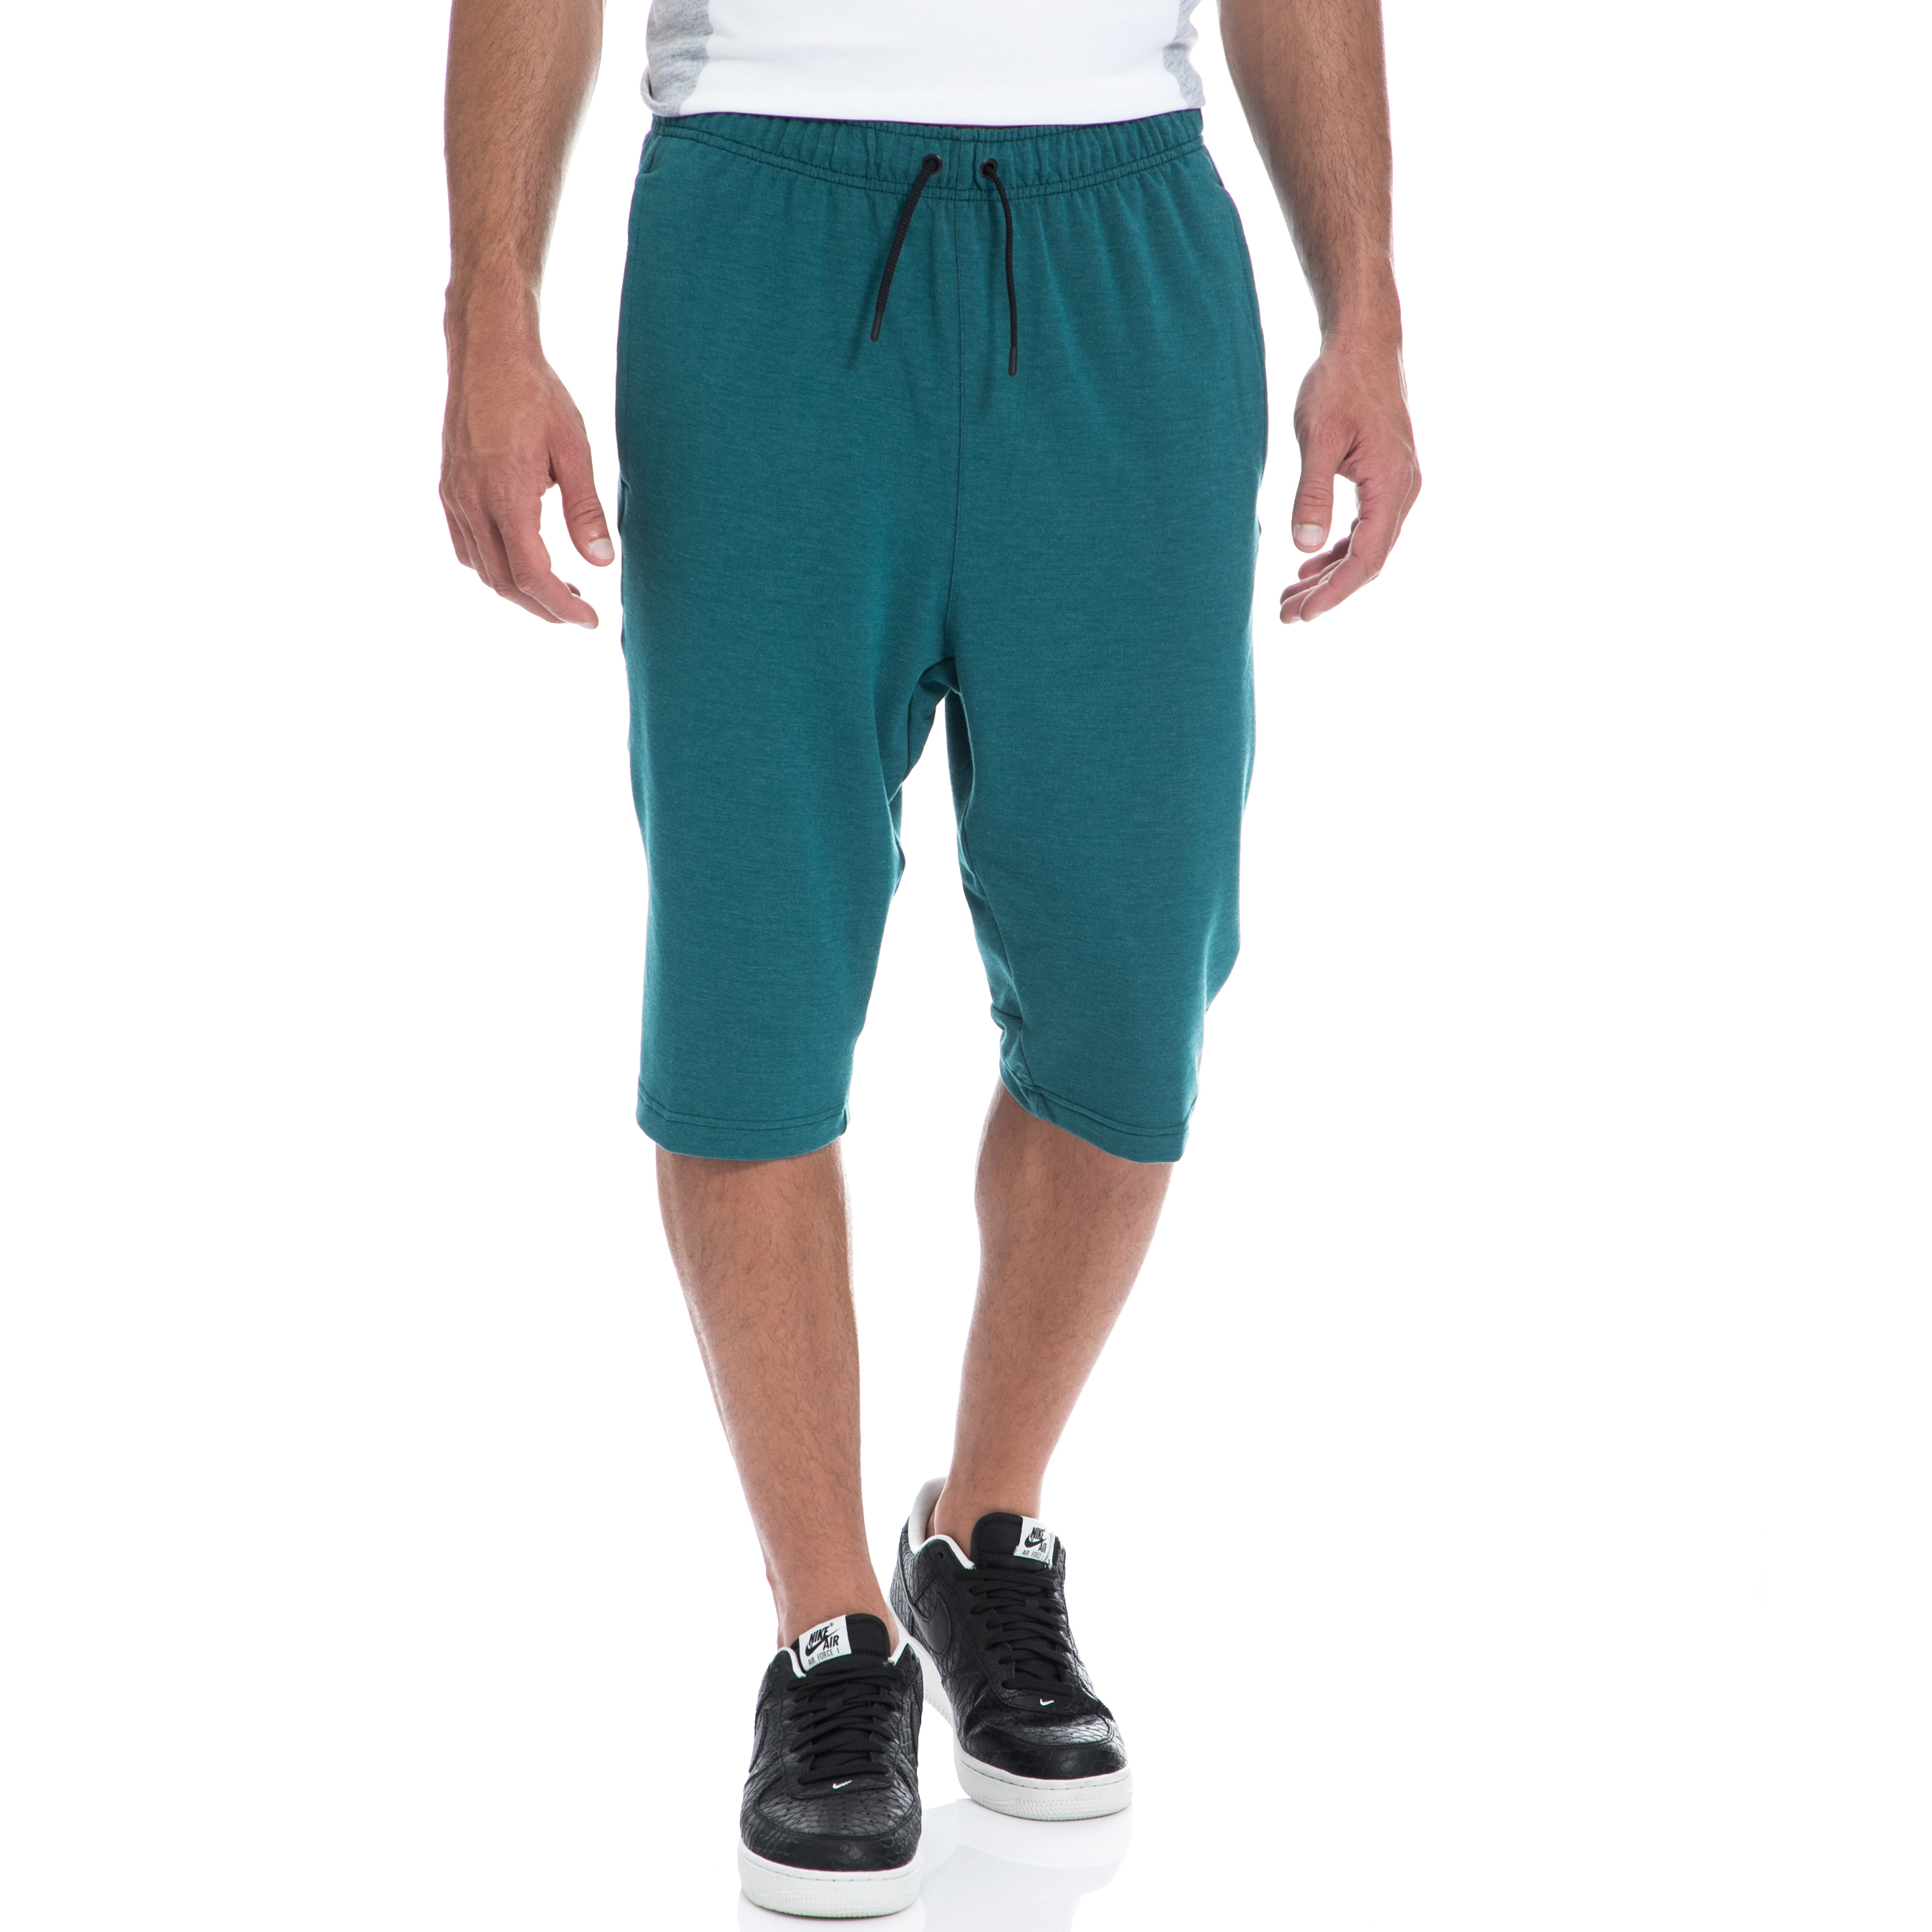 NIKE - Αντρική βερμούδα NIKE πράσινη ανδρικά ρούχα σορτς βερμούδες αθλητικά